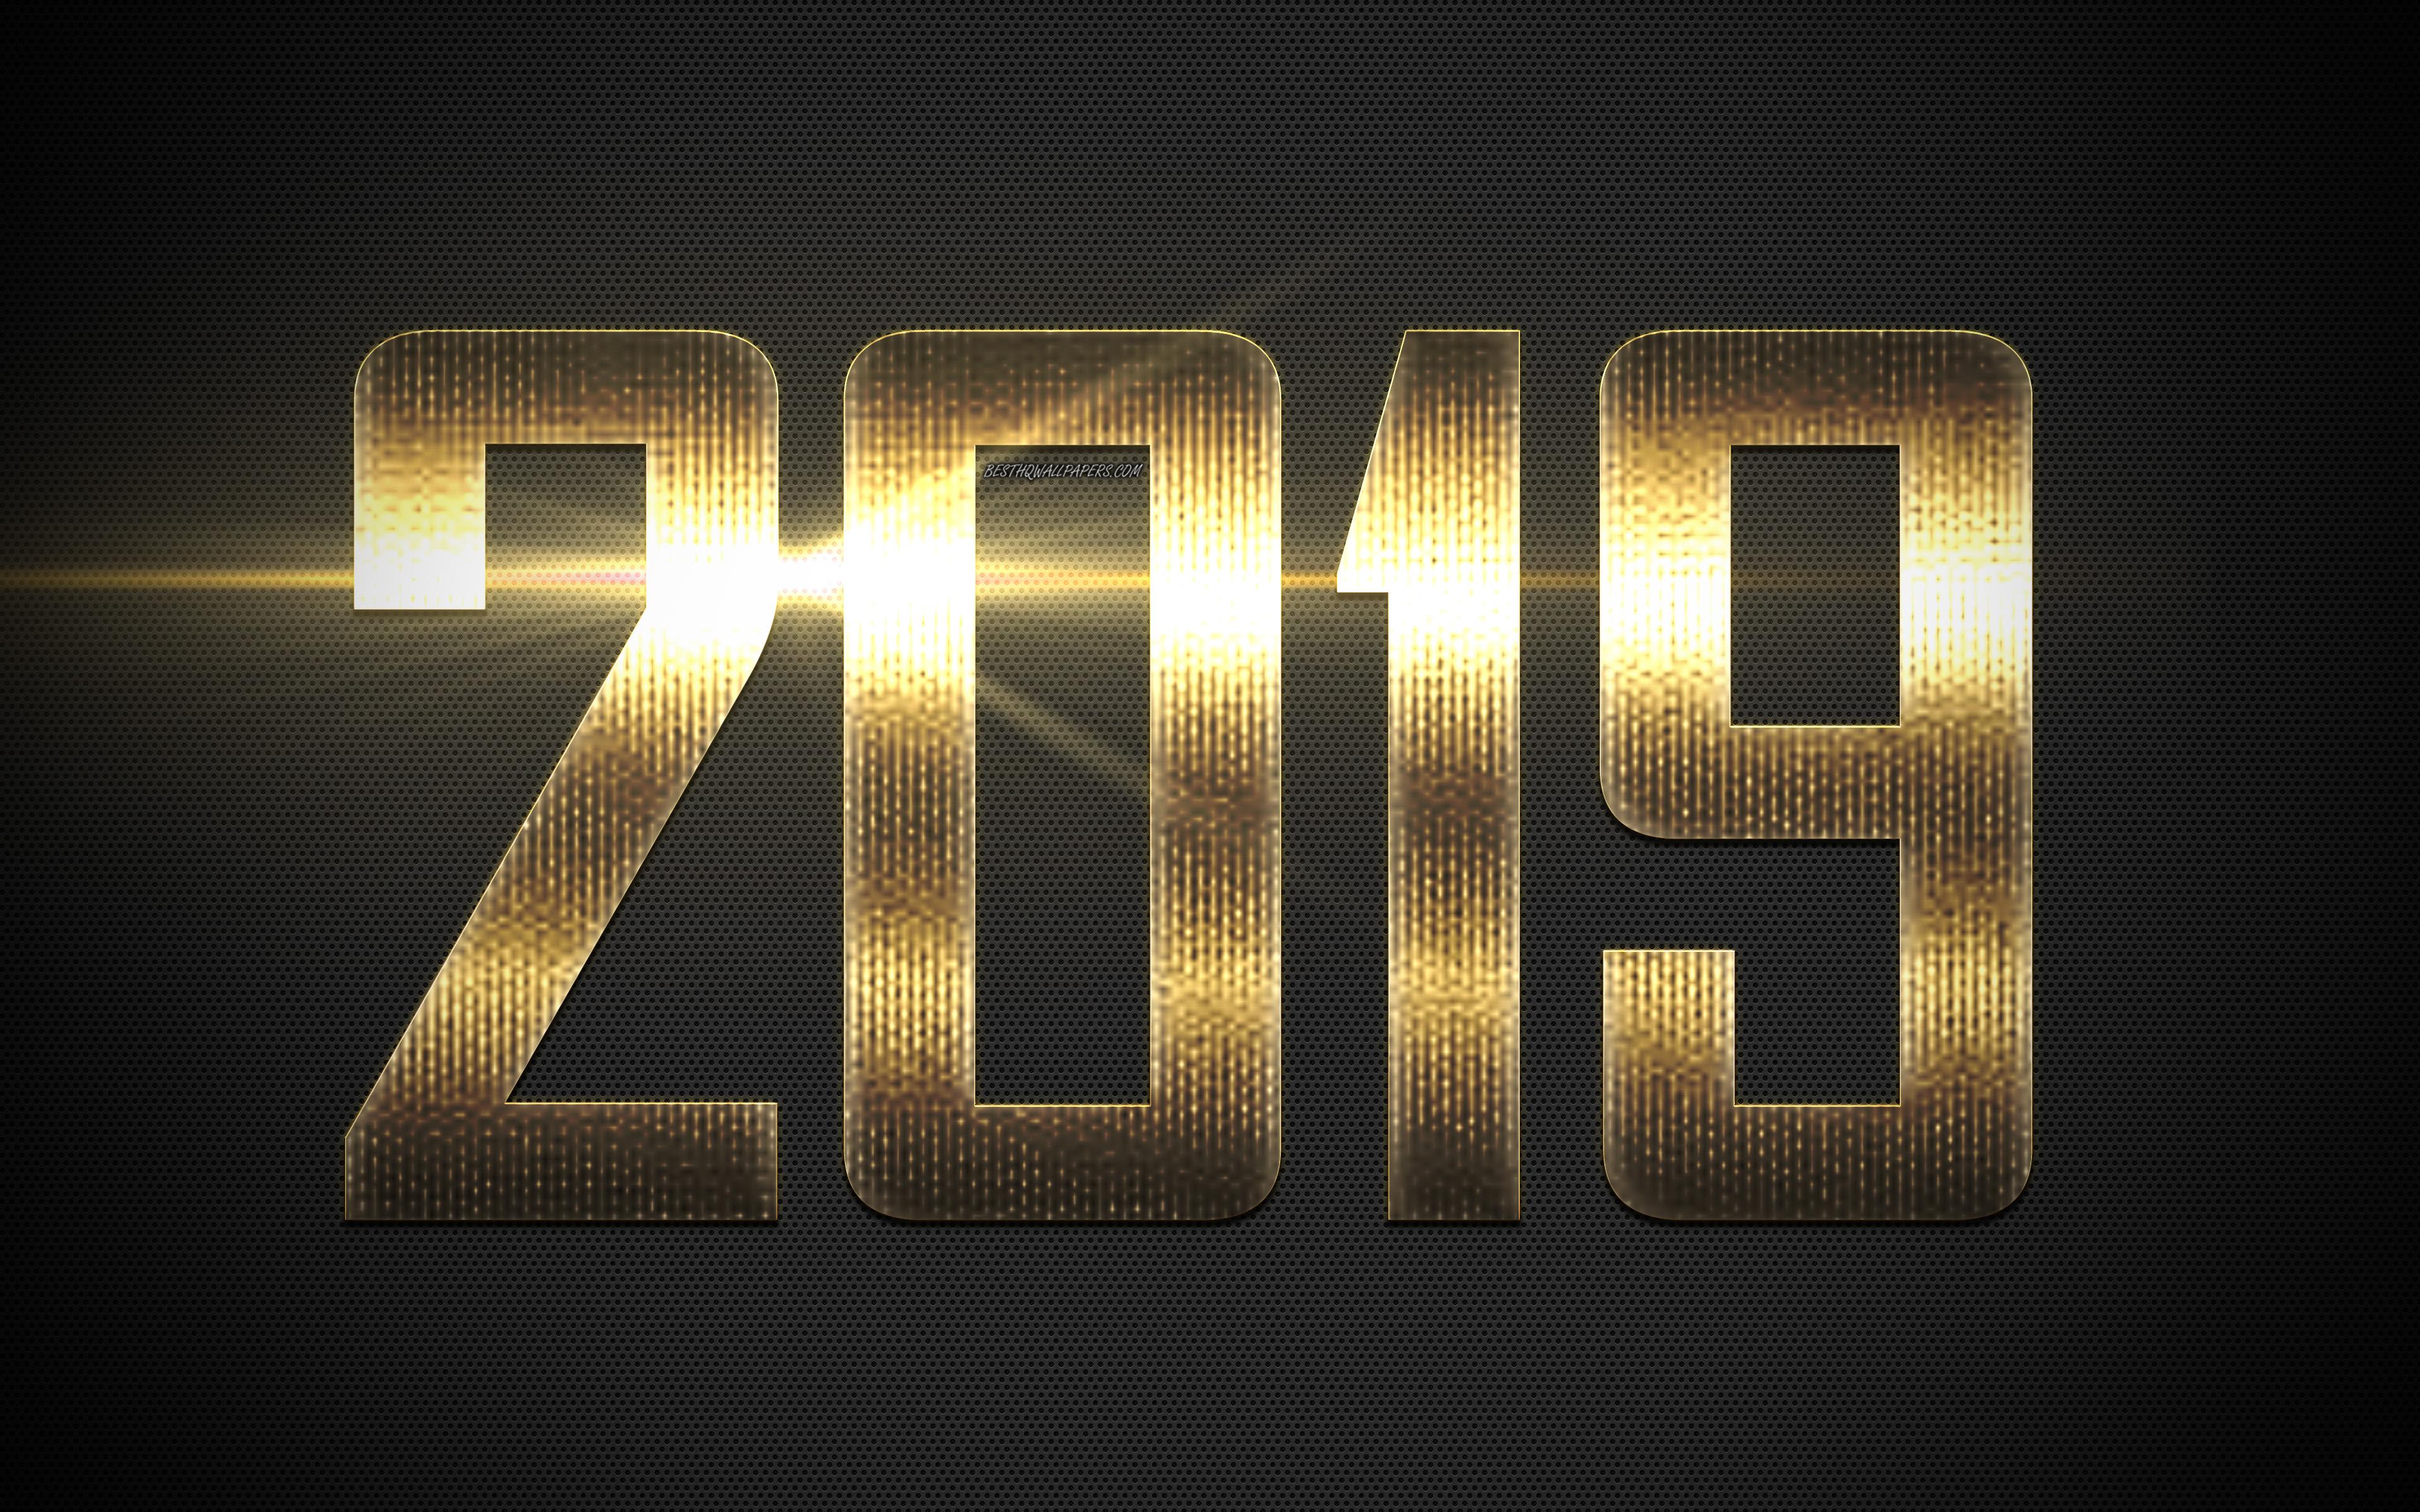 New Year 2019 4k Ultra HD Wallpaper  Background Image  3840x2400